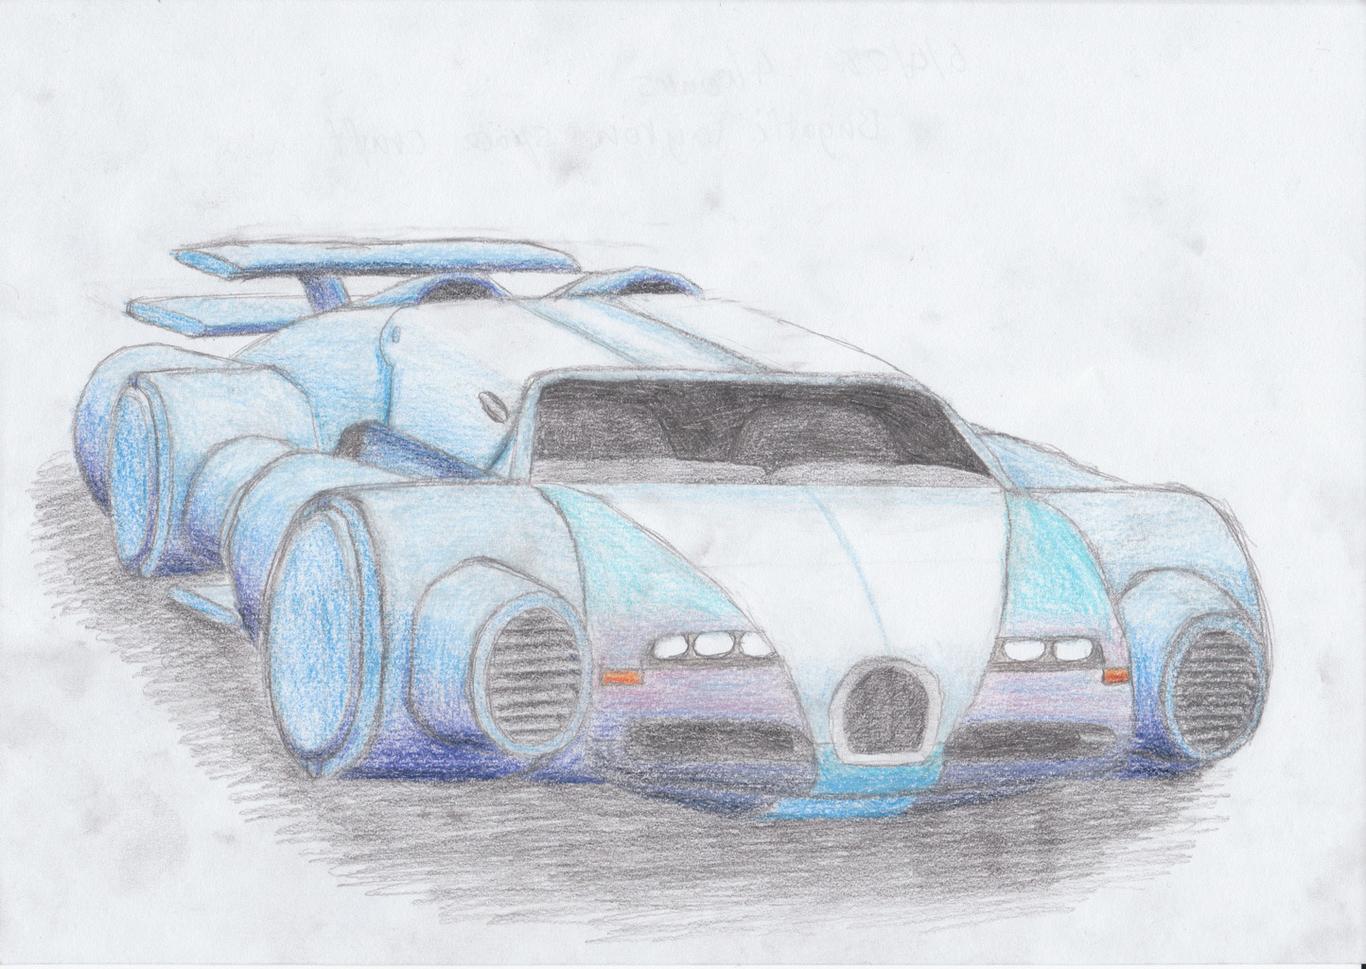 Bugatti Veyron Spaceship Sketch By Benmcwhae 2d Cgsociety